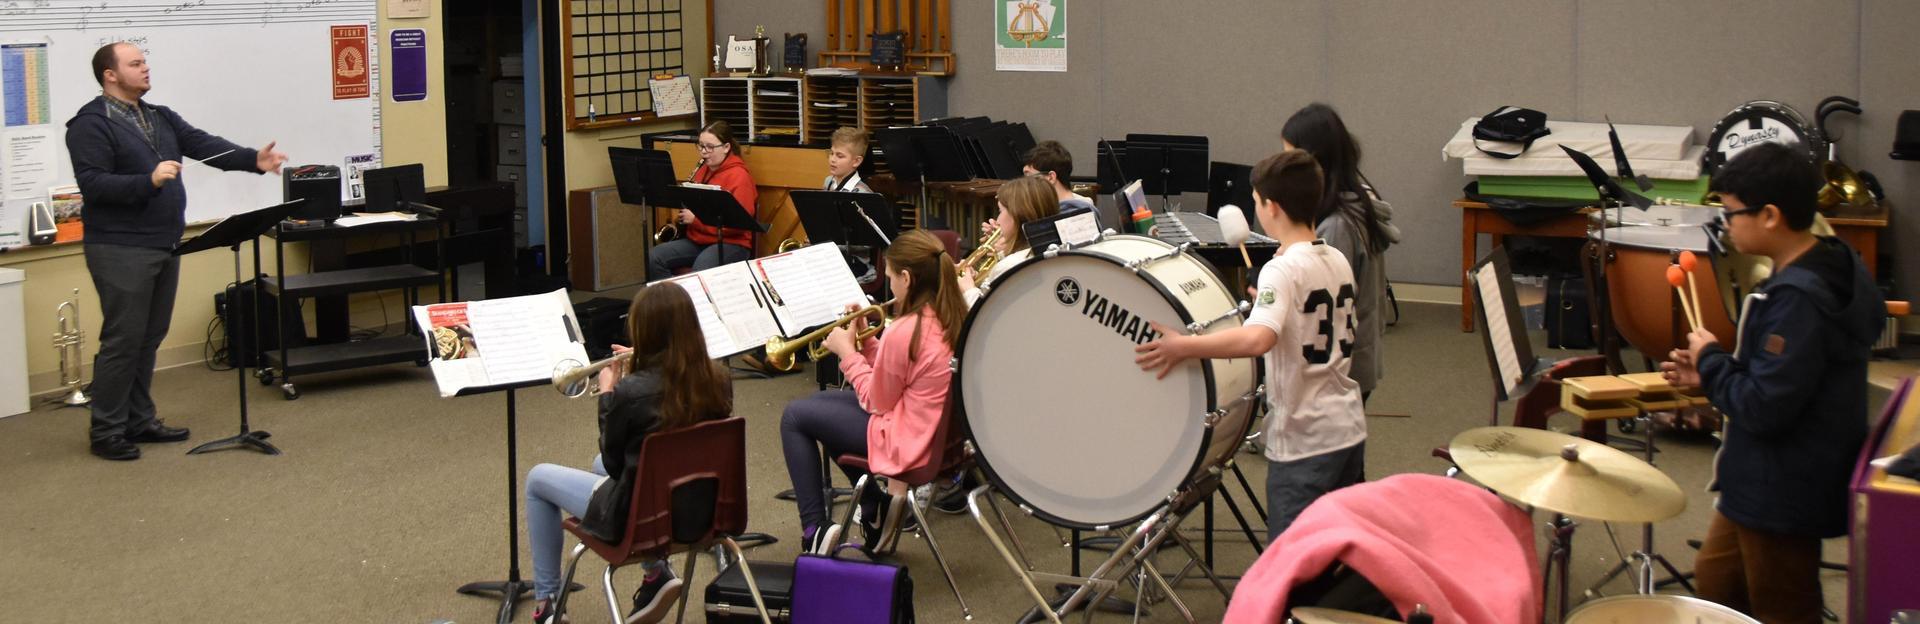 Junior High Band students